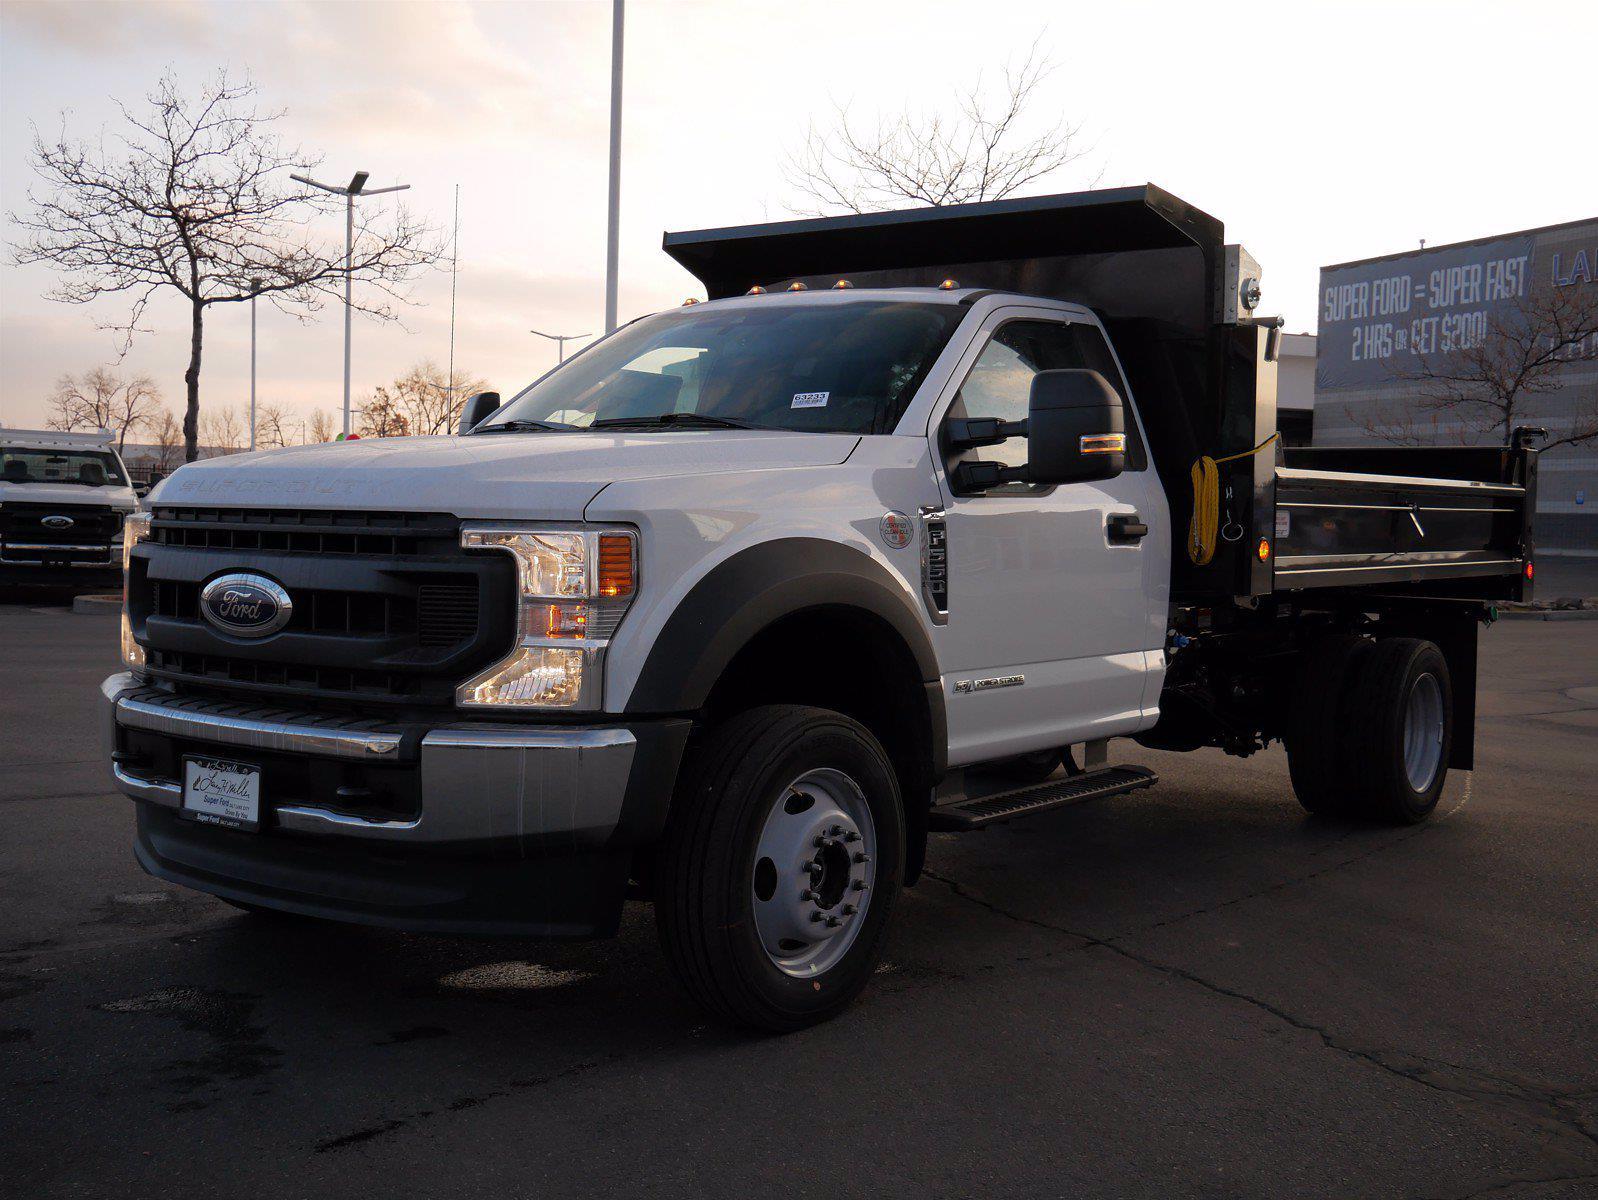 2021 Ford F-550 Regular Cab DRW 4x4, Scelzi Dump Body #64083 - photo 1